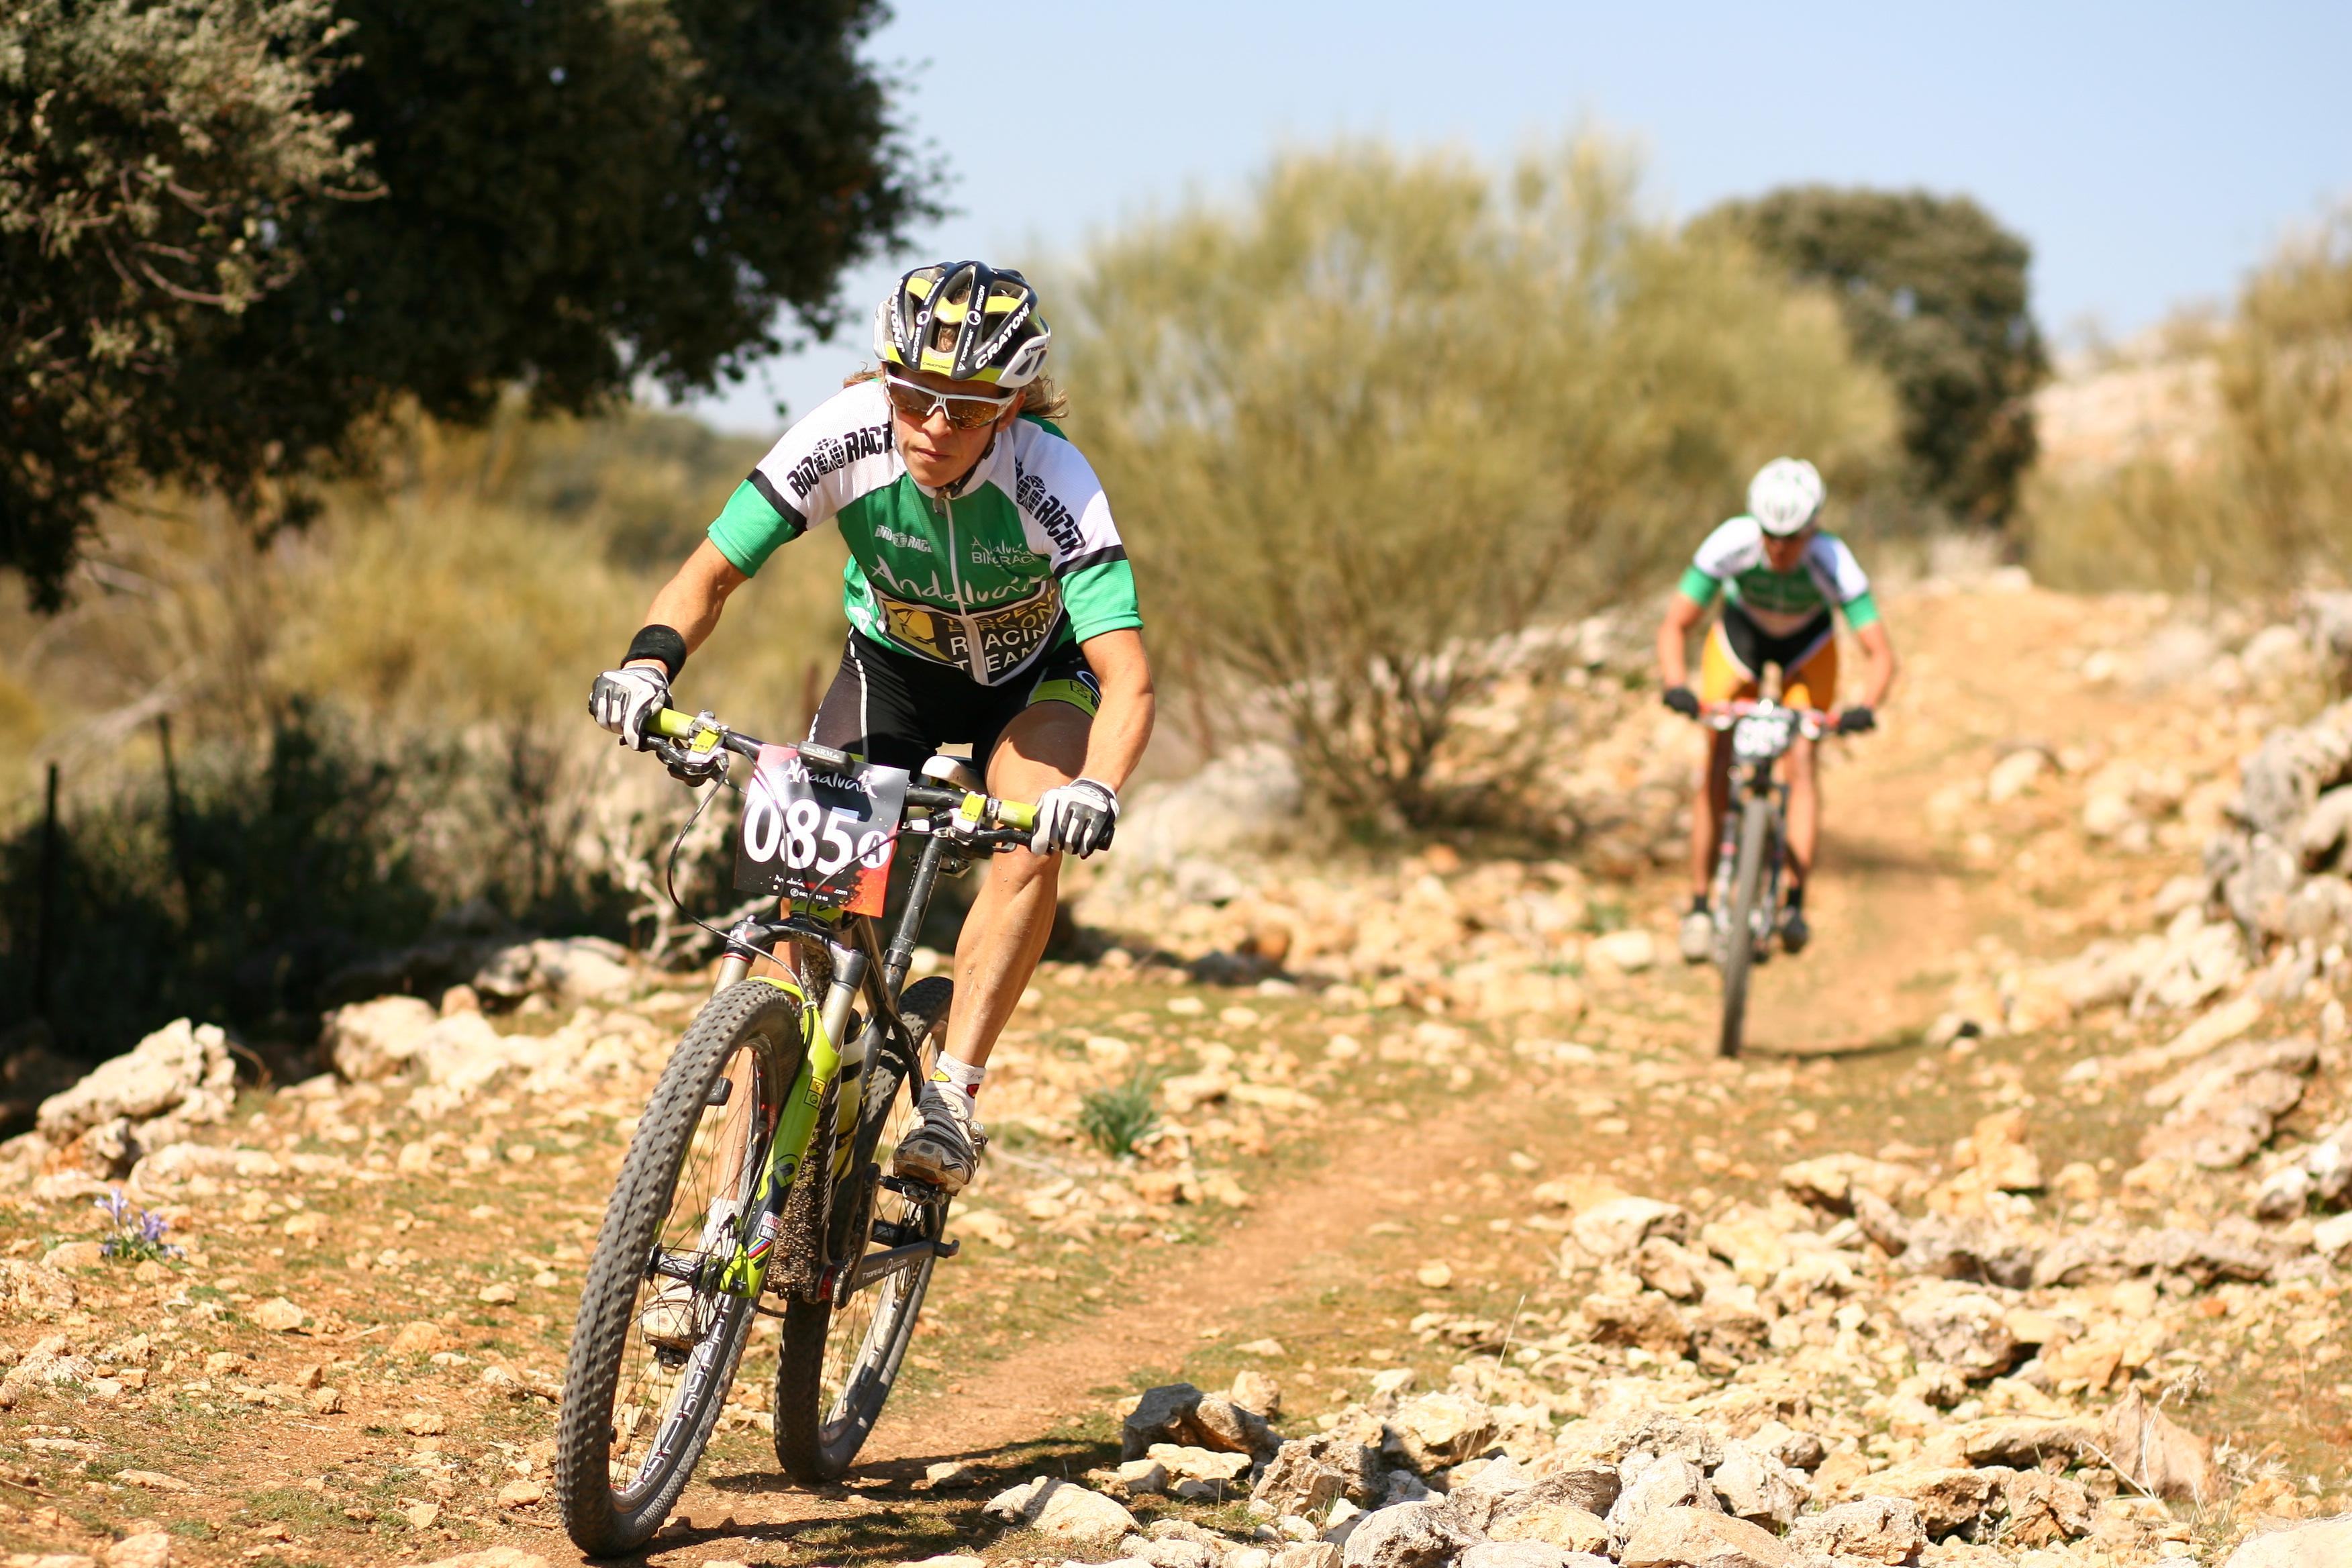 Andalucía Bike Race Fuente: bikemagic.com